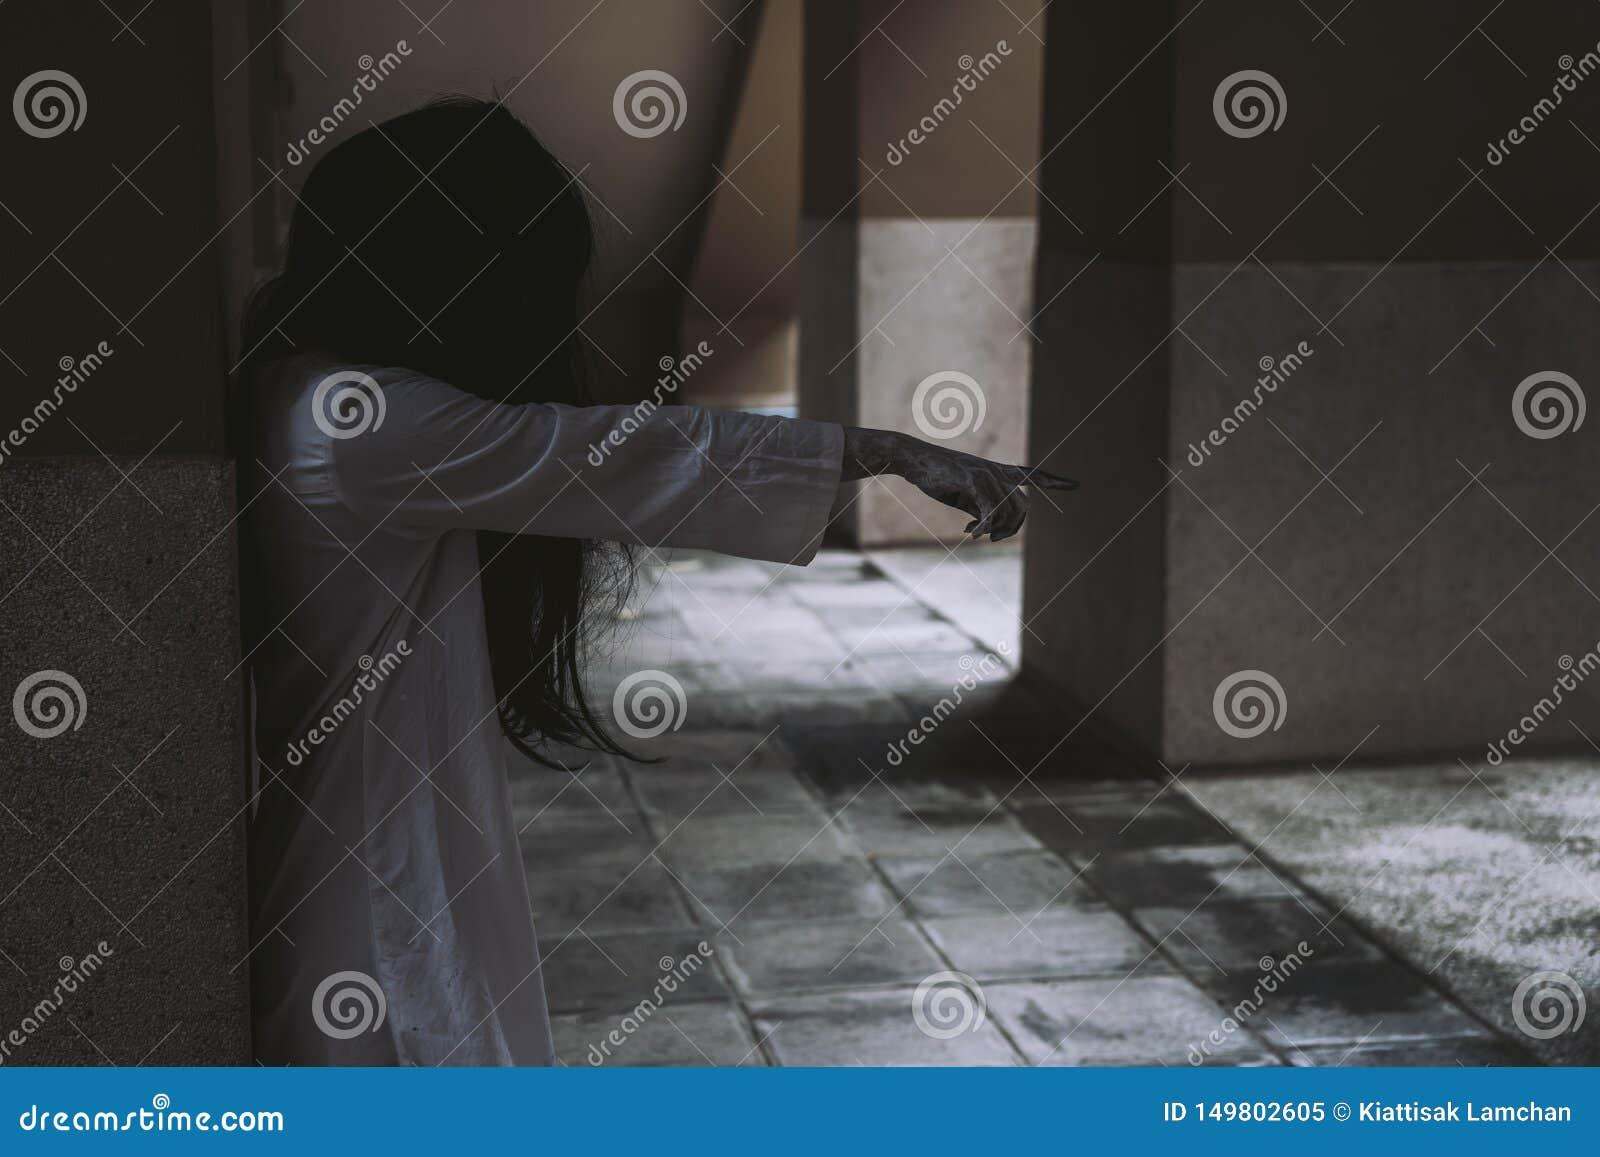 Horror scene of ghost woman death movie film halloween